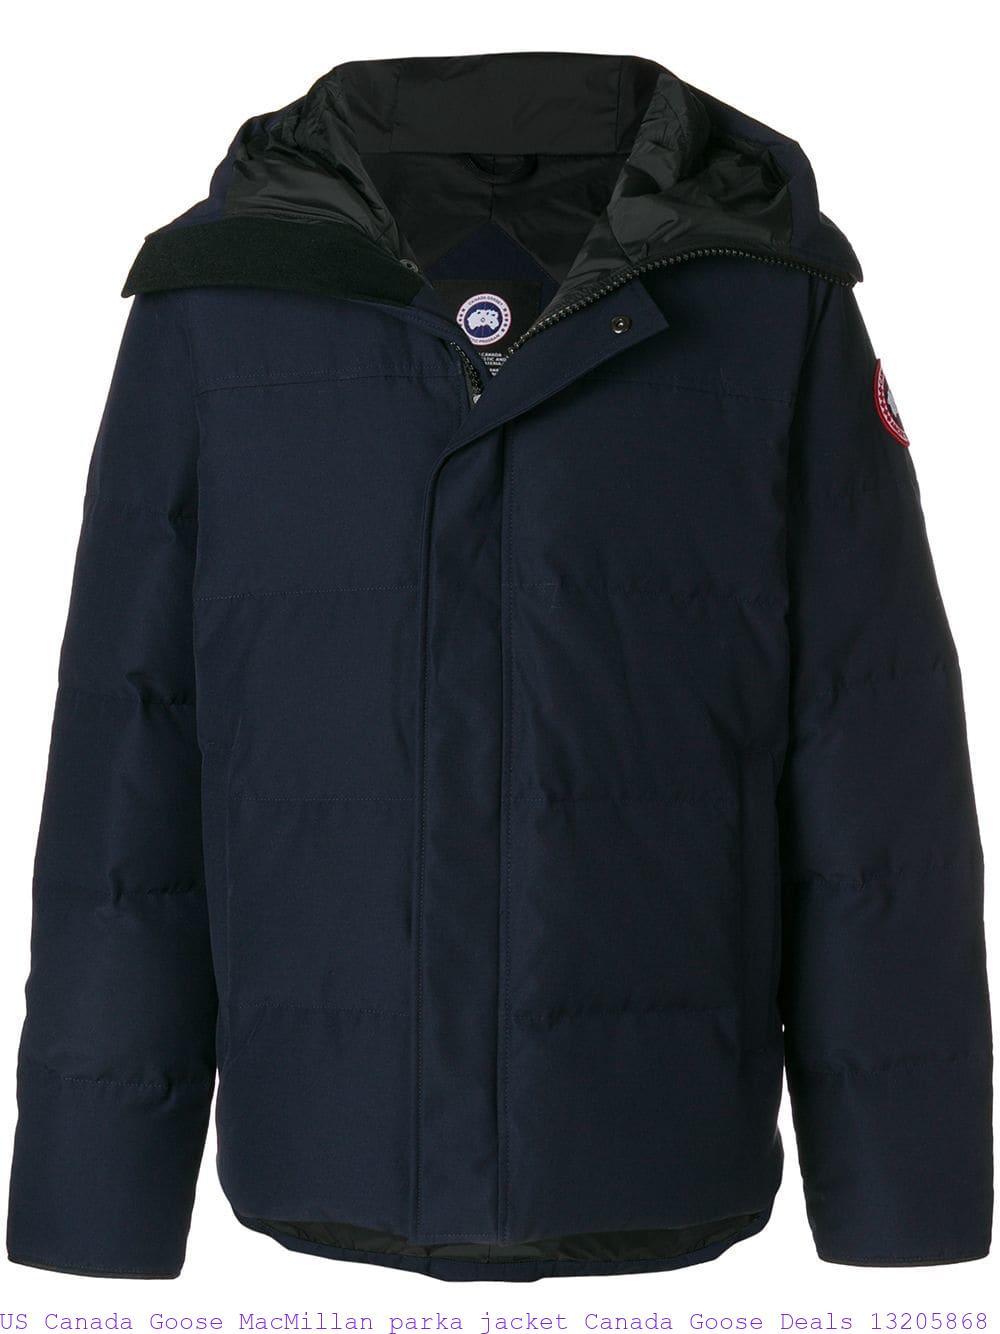 canada goose jacket online usa